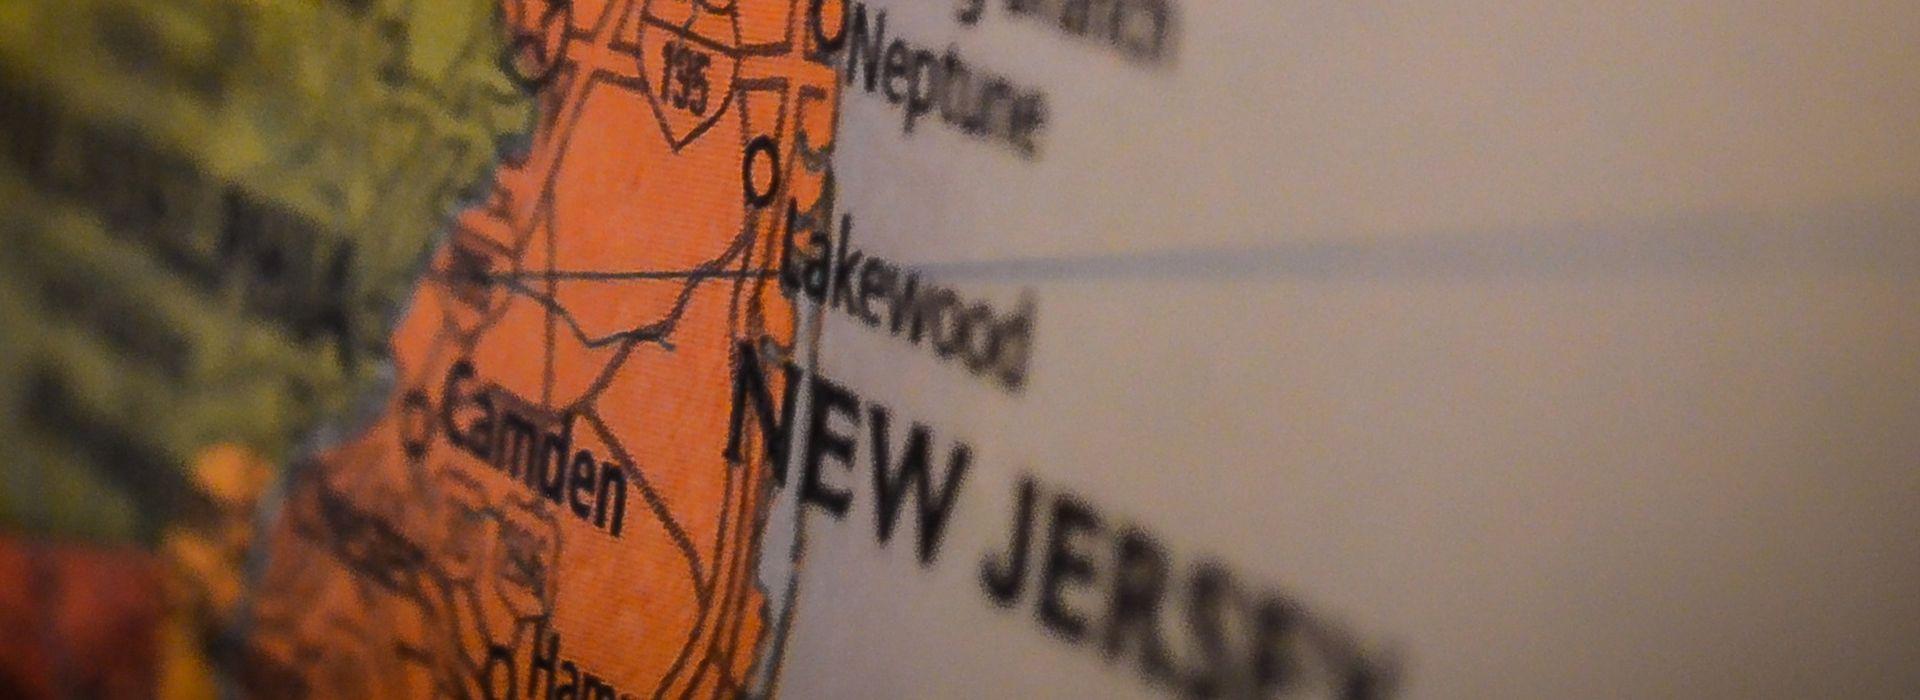 Eksplozija u New Jerseyju, otkazana humanitarna utrka